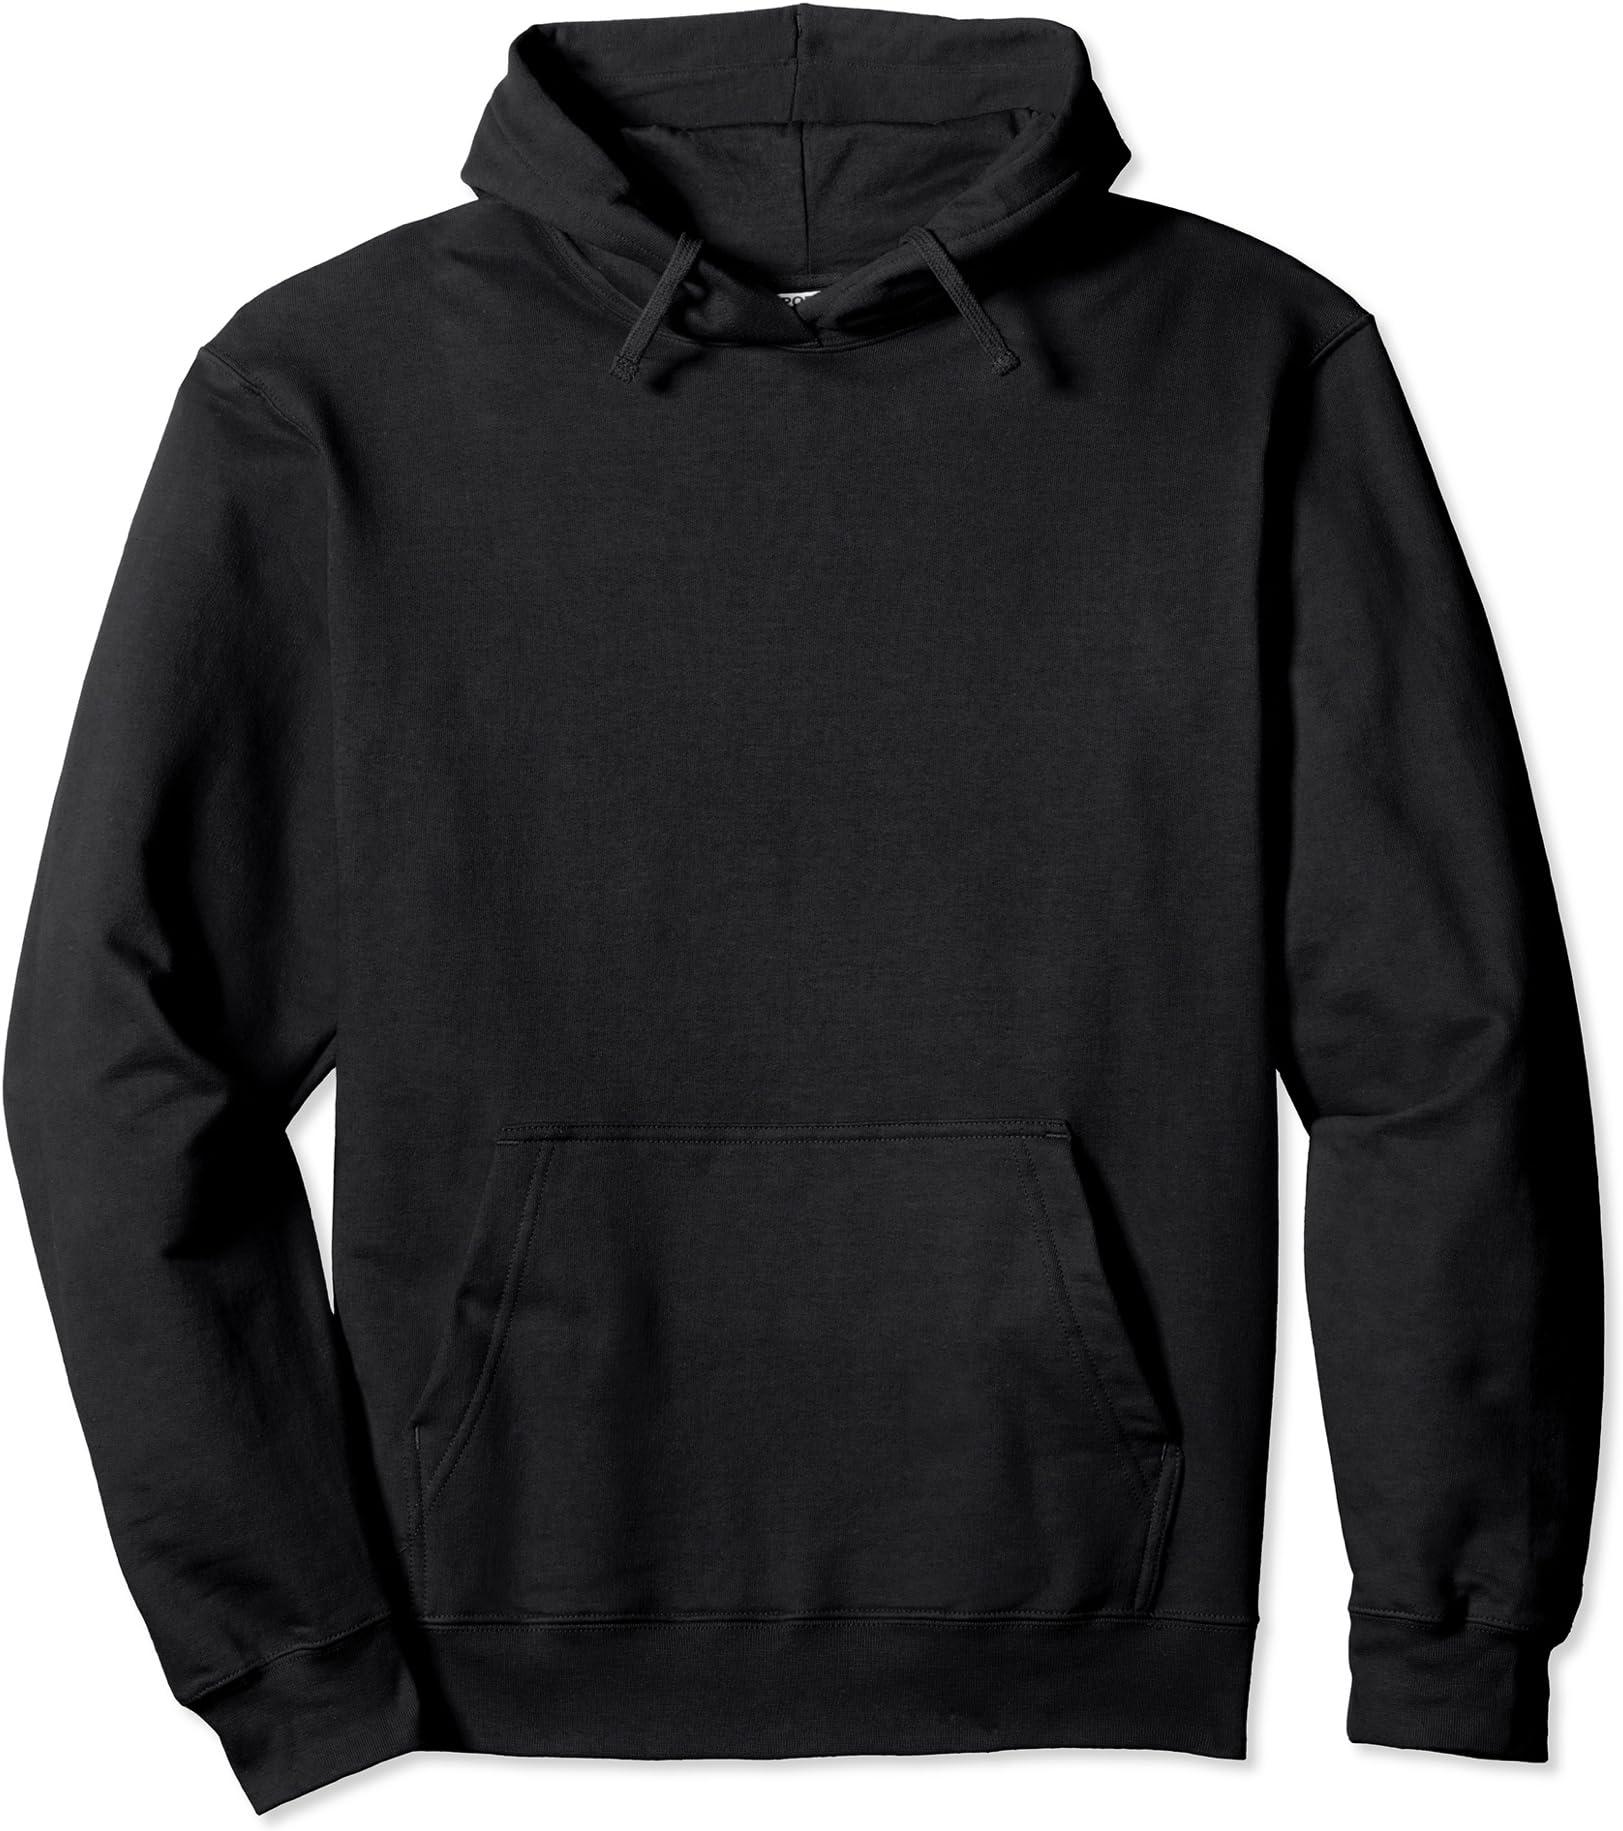 Education is Important But Clarinet is Importanter Hoodie Sweatshirt